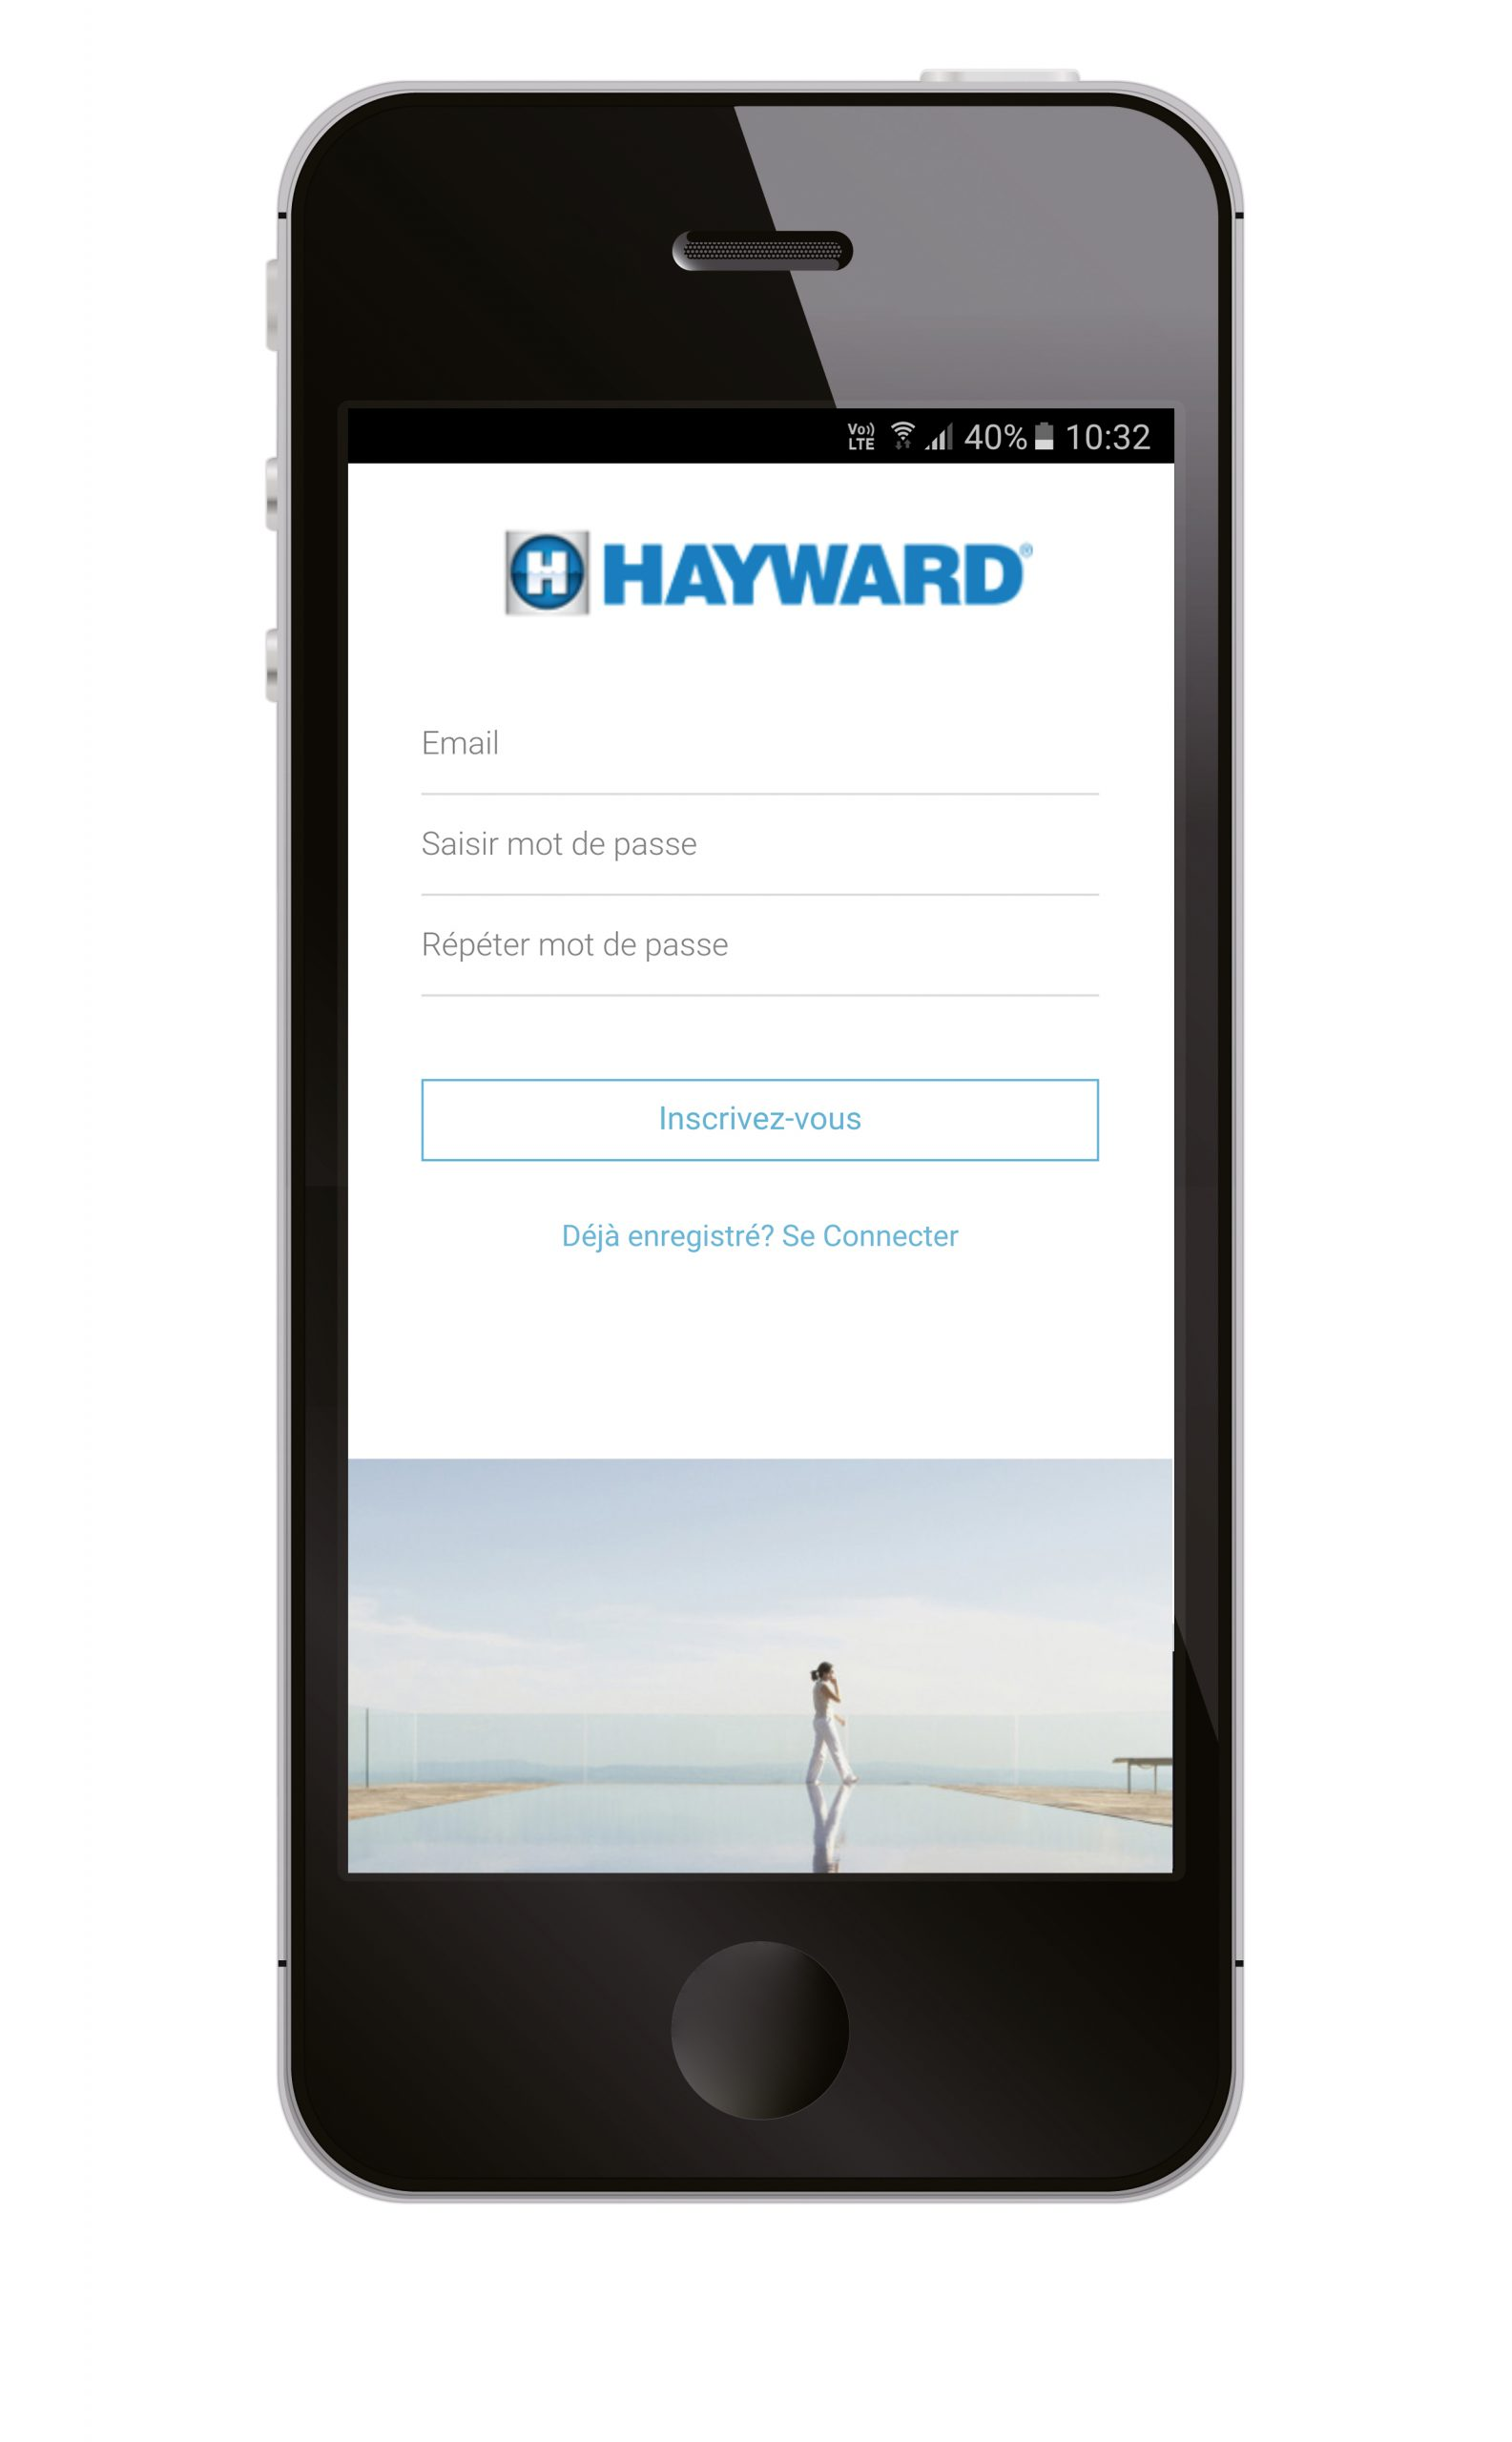 Hayward Control Station concernant Thermometre Piscine Connecté